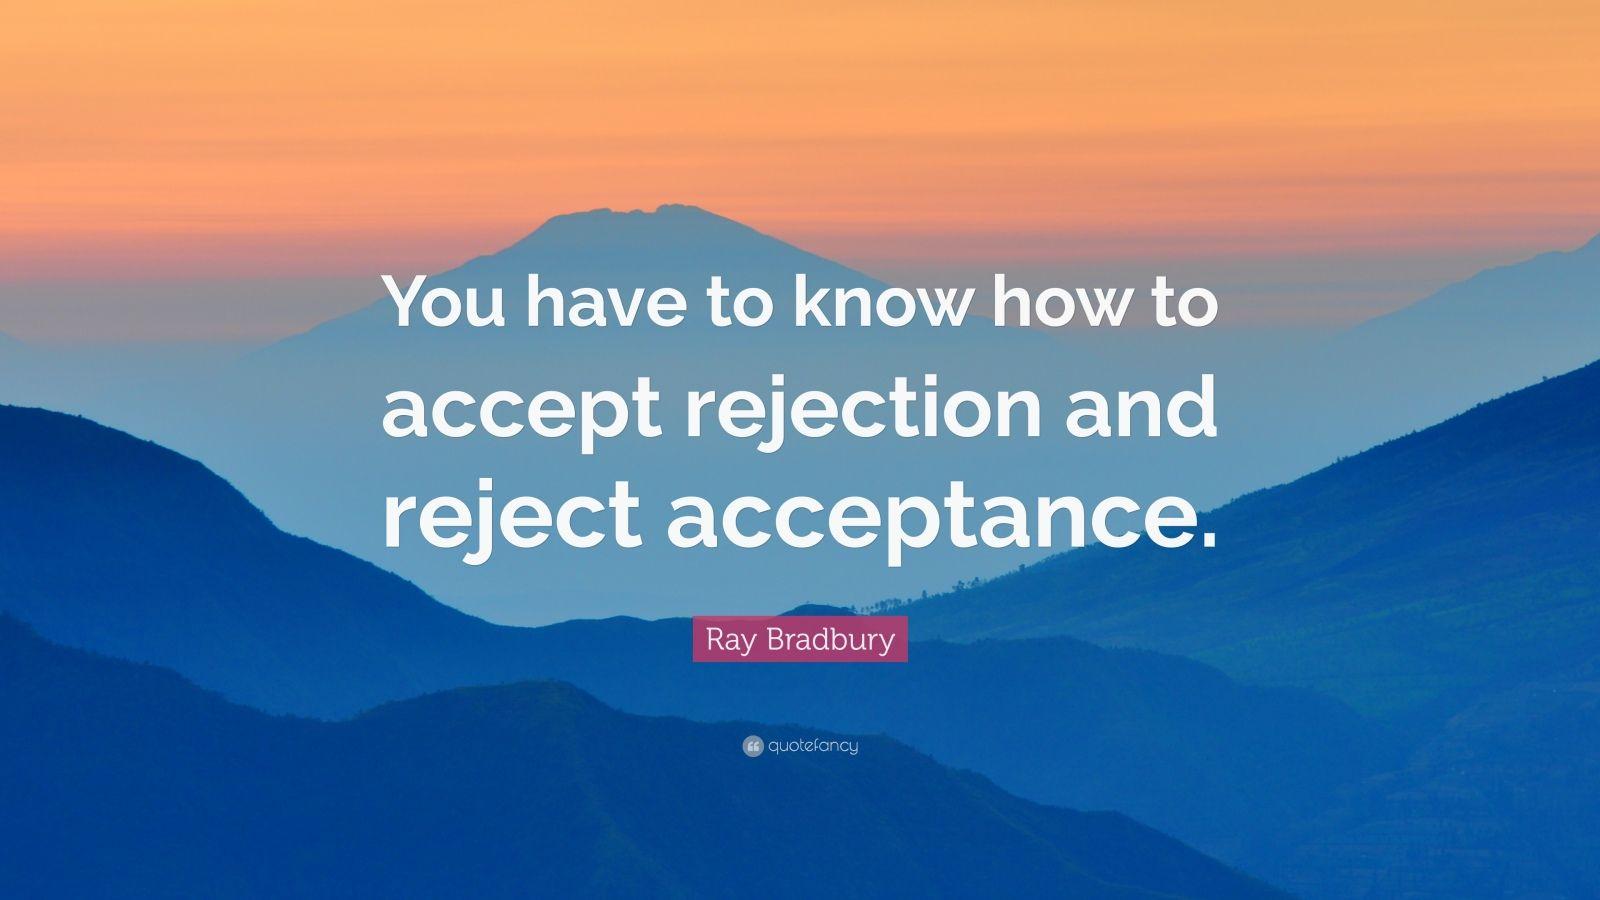 ray bradbury essay on rejection coursework academic service  ray bradbury essay on rejection